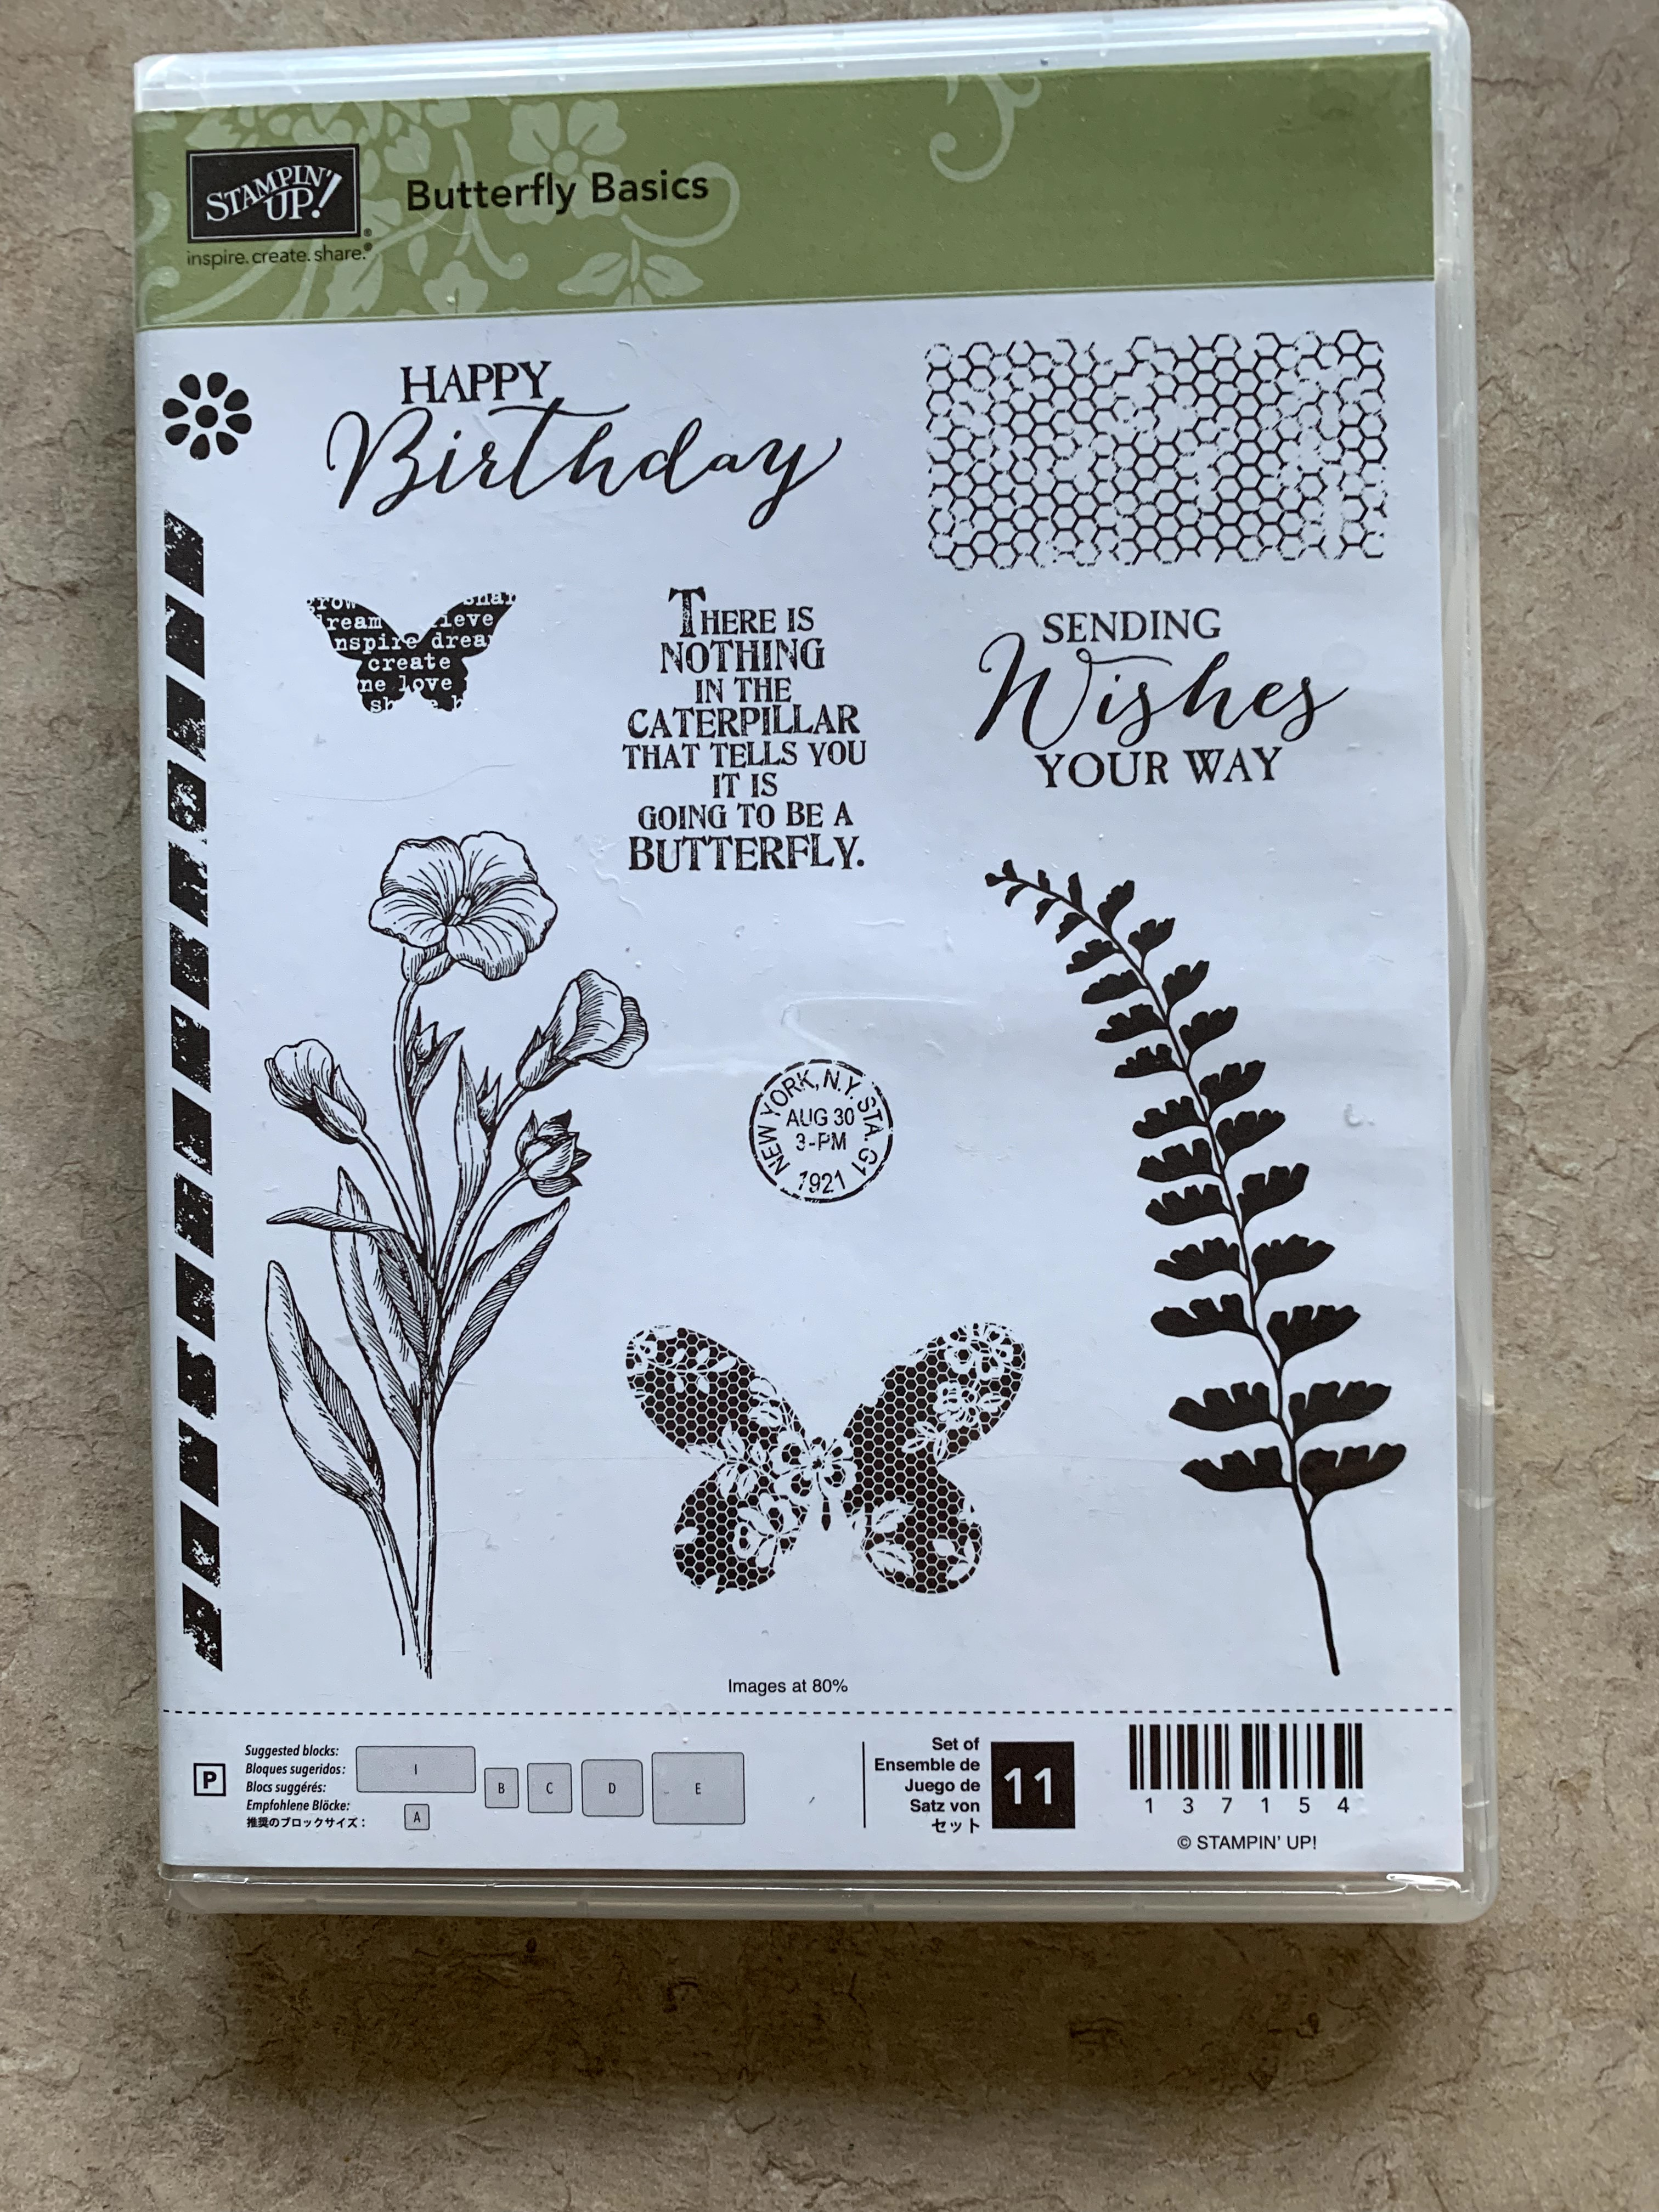 Stampin' Up! Butterfly Basics photopolymer stamp set